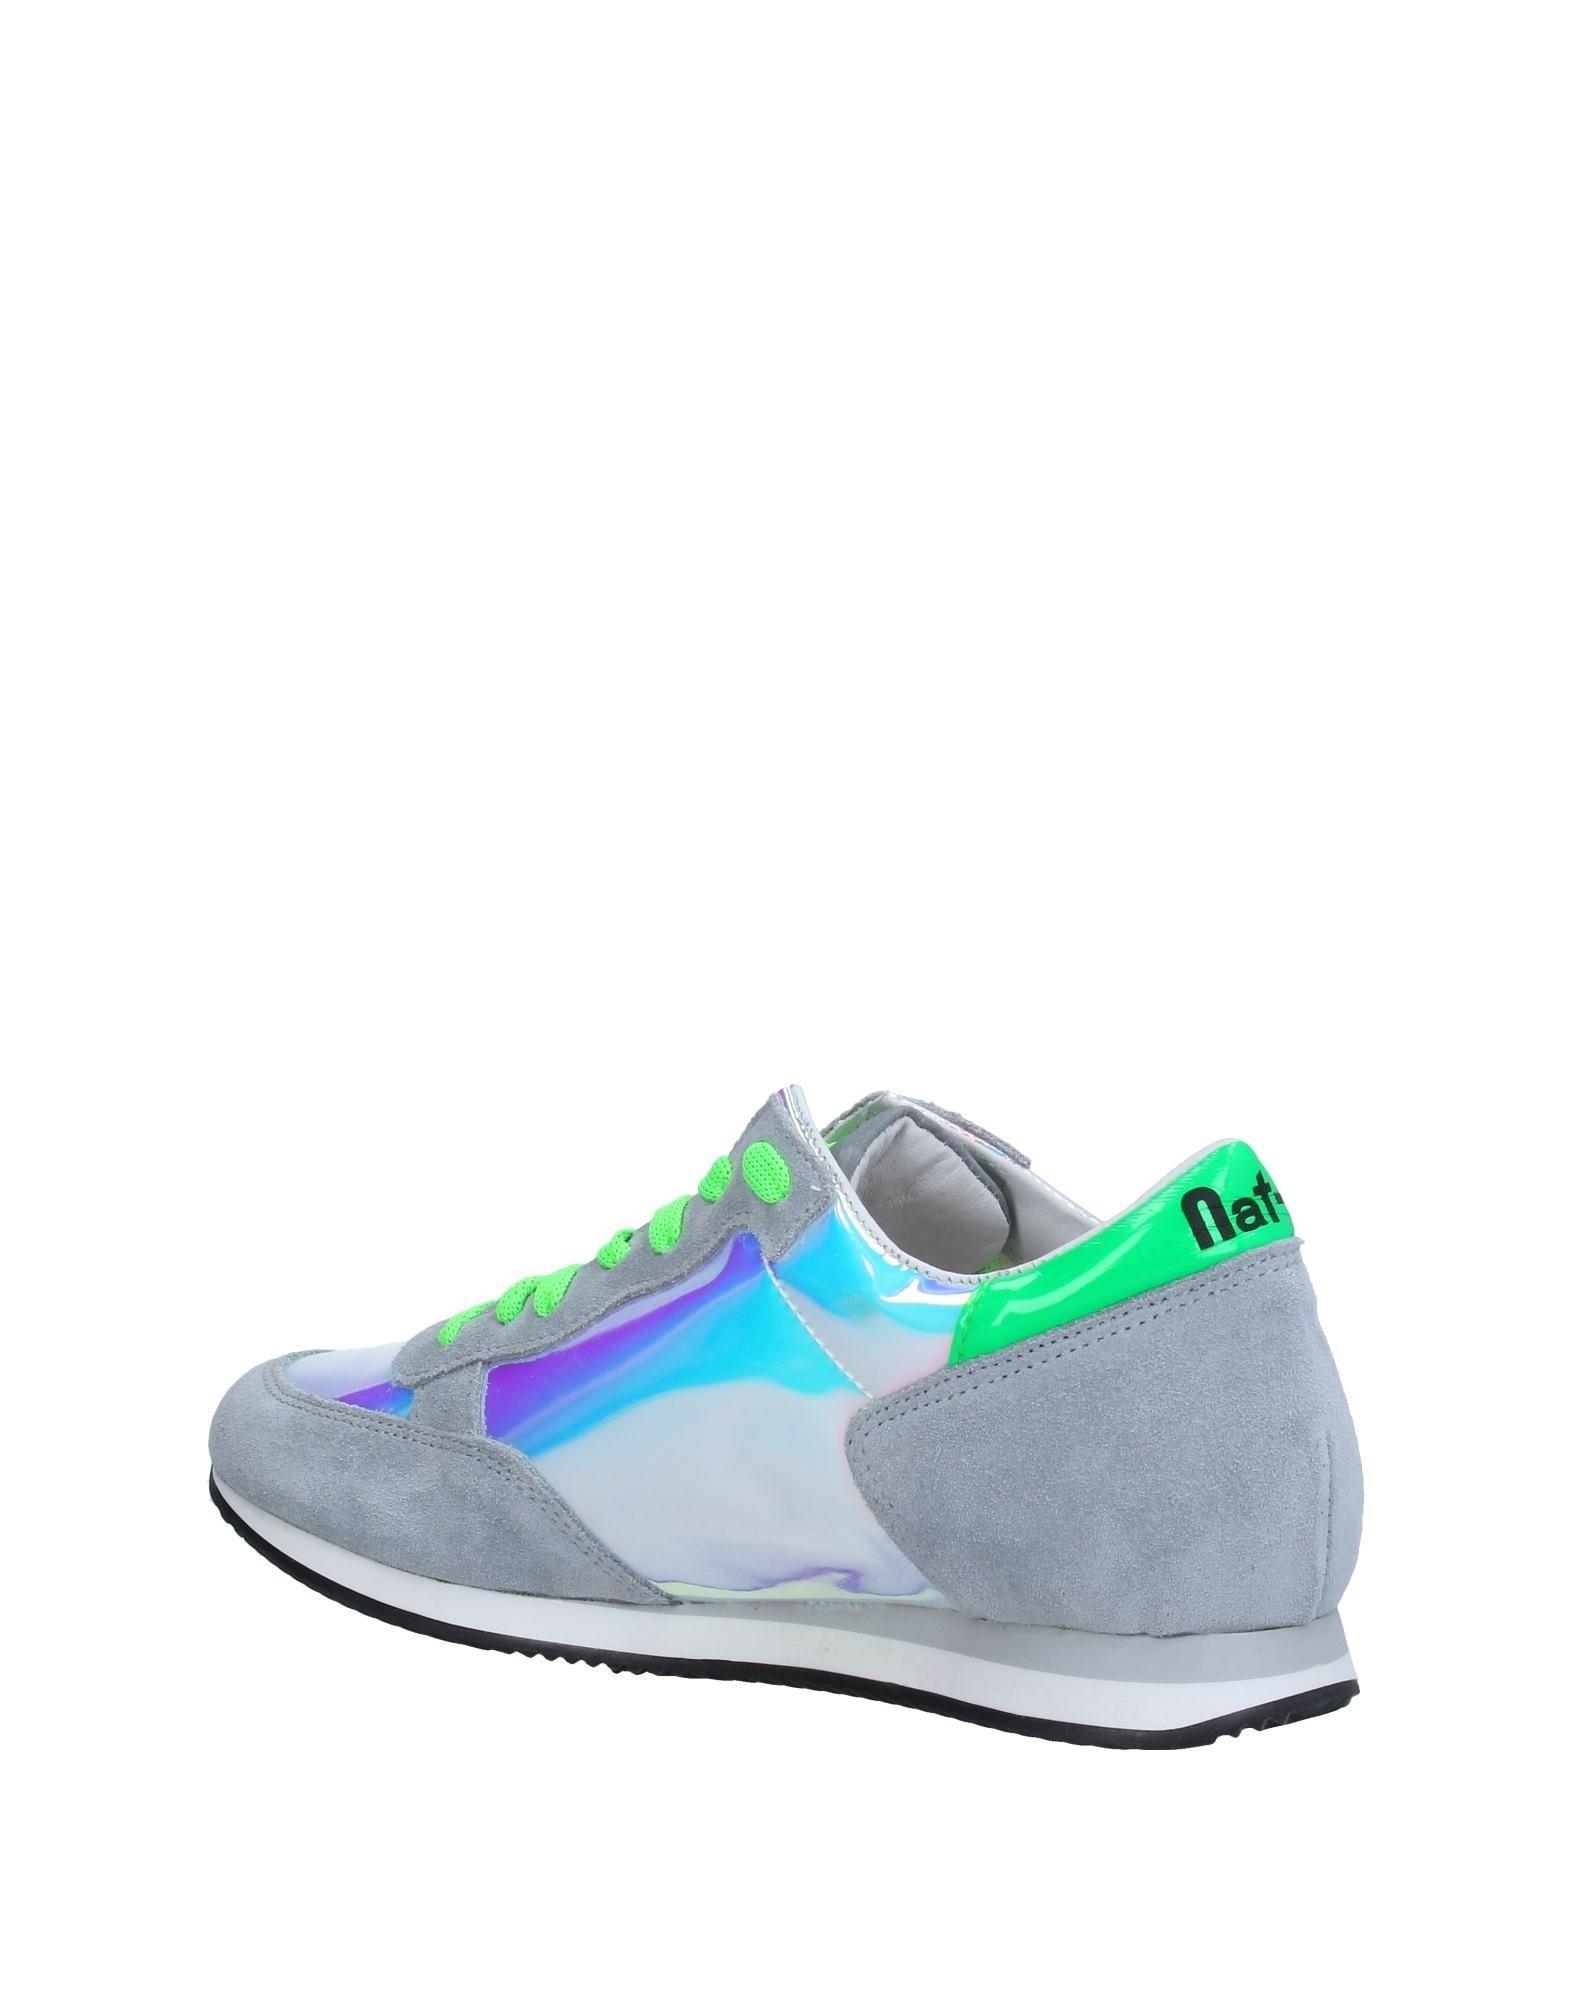 Sneakers Nat-2 Homme - Sneakers Nat-2 sur